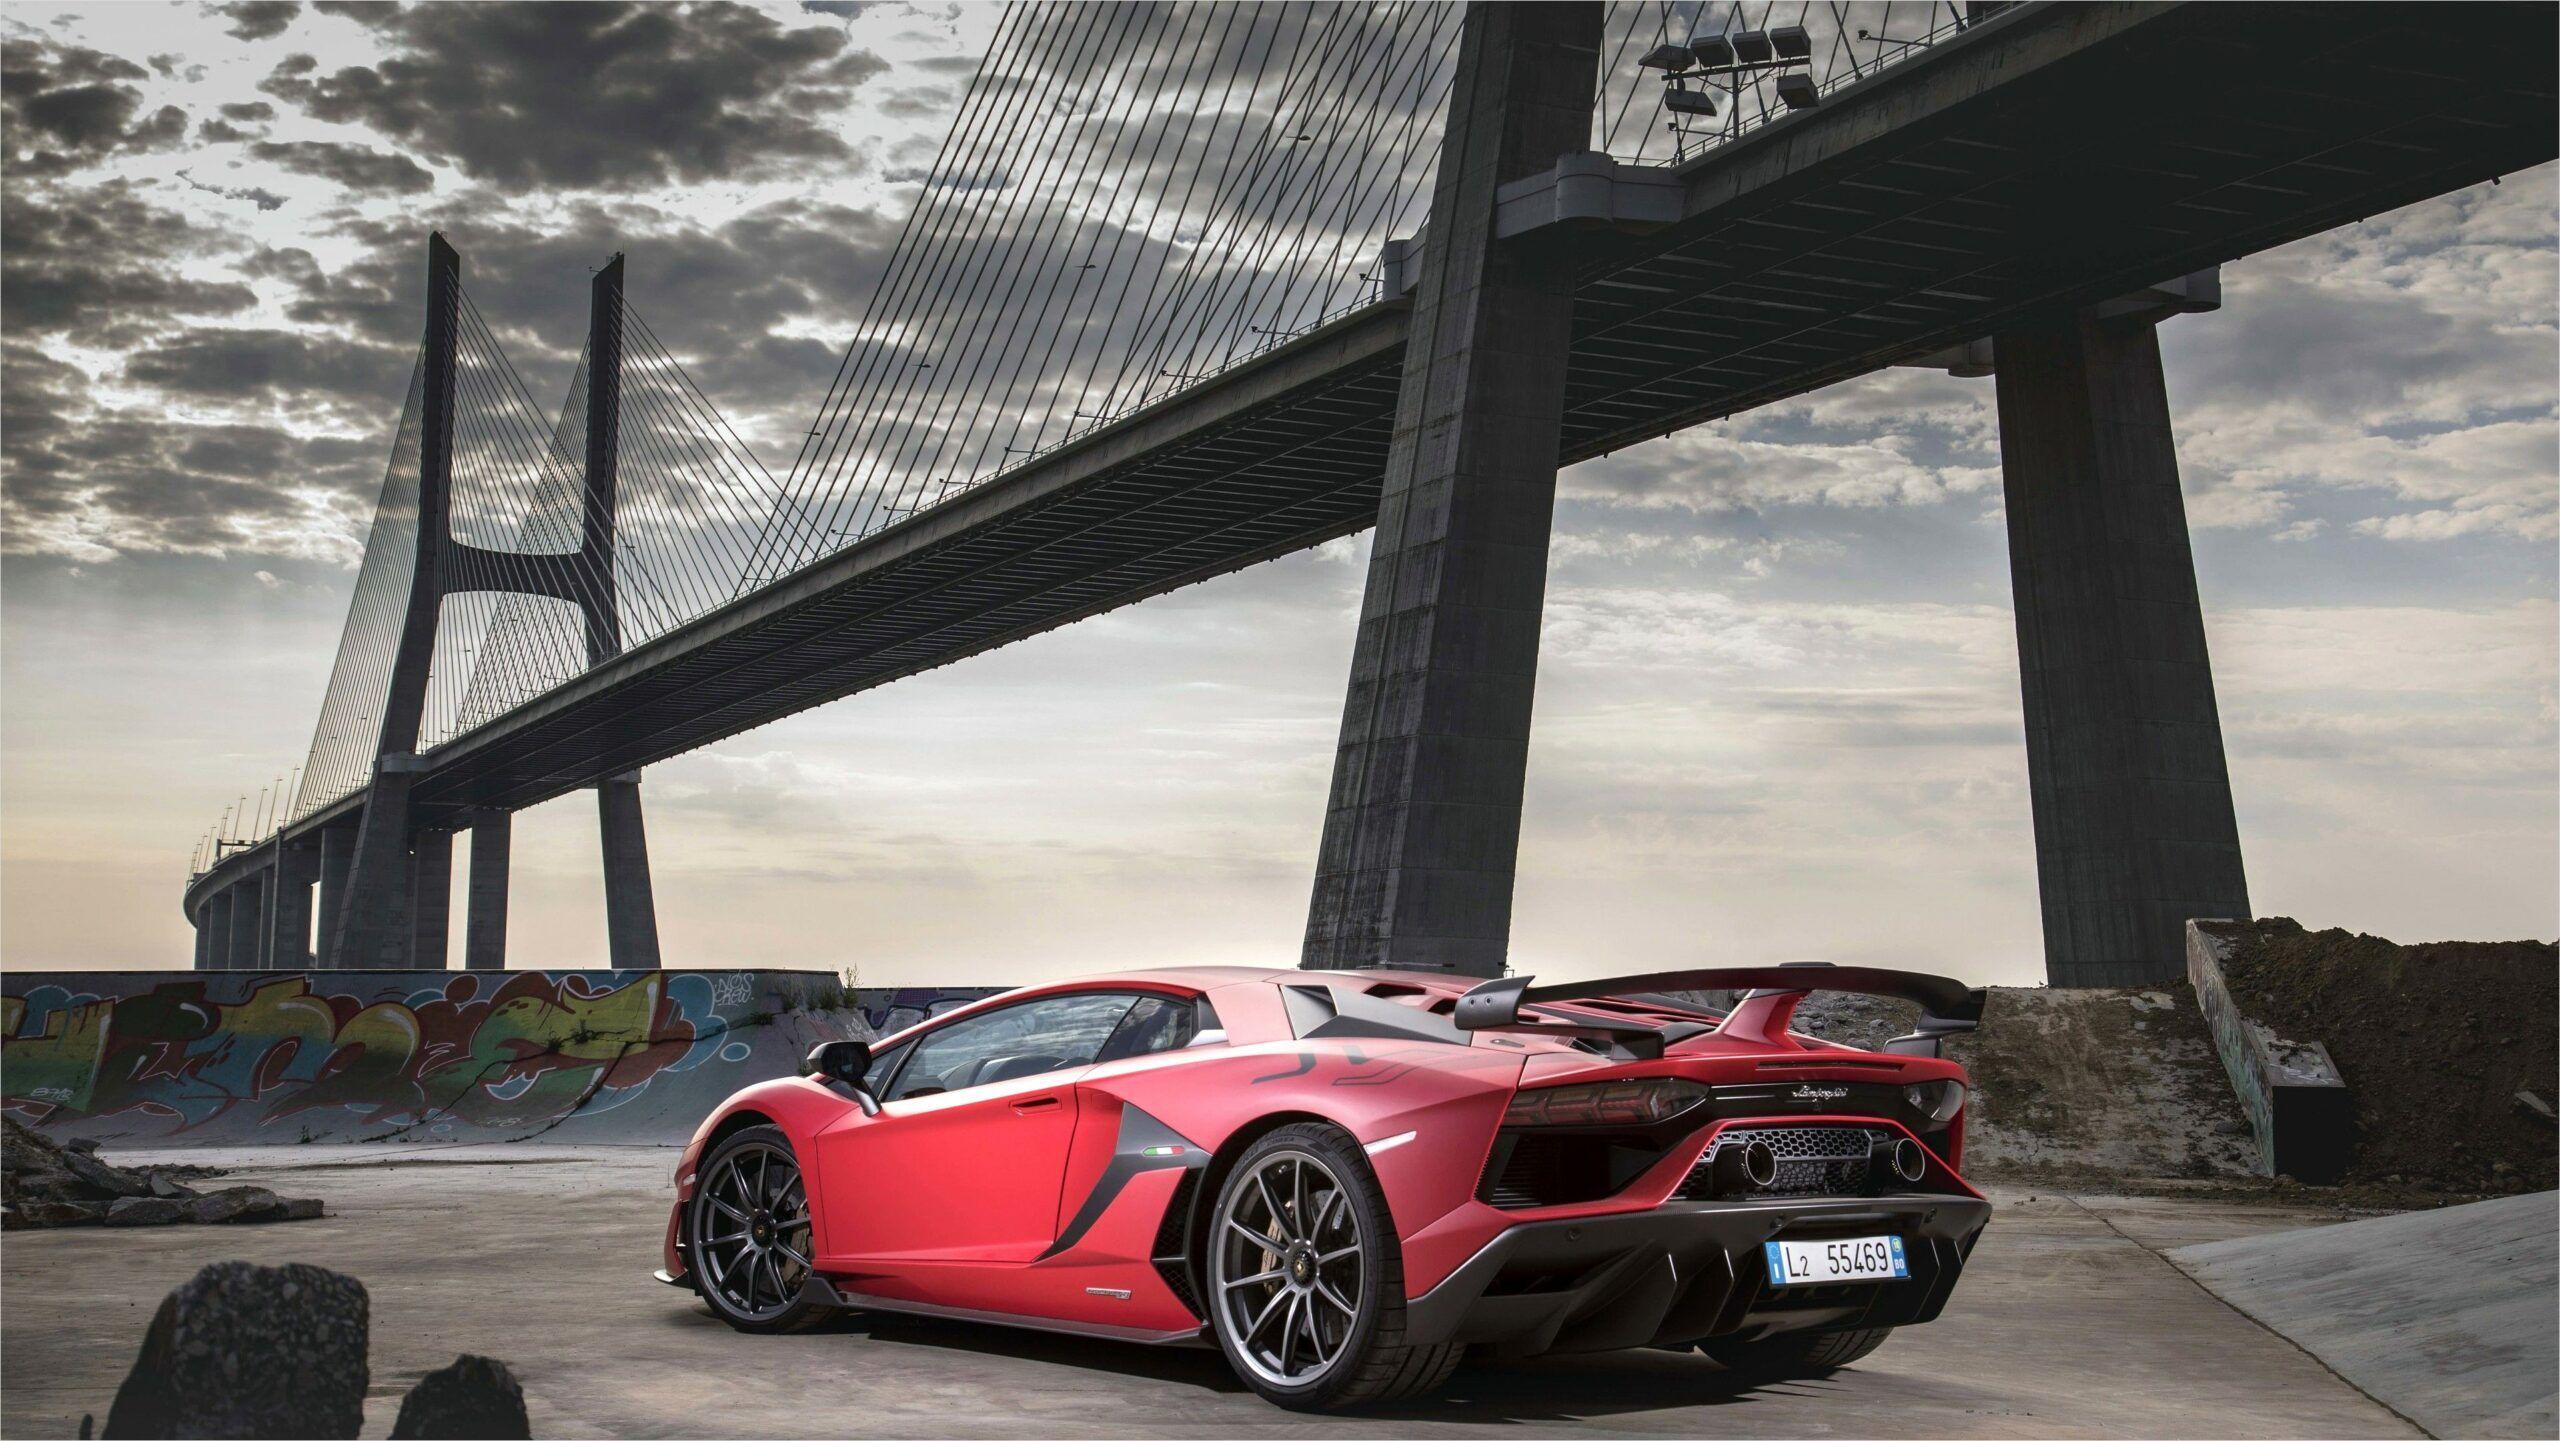 Ultra Hd 4k Lamborghini Wallpapers Hd Desktop Backgrounds Lamborghini Cars Lamborghini Aventador Wallpaper Car Wallpapers